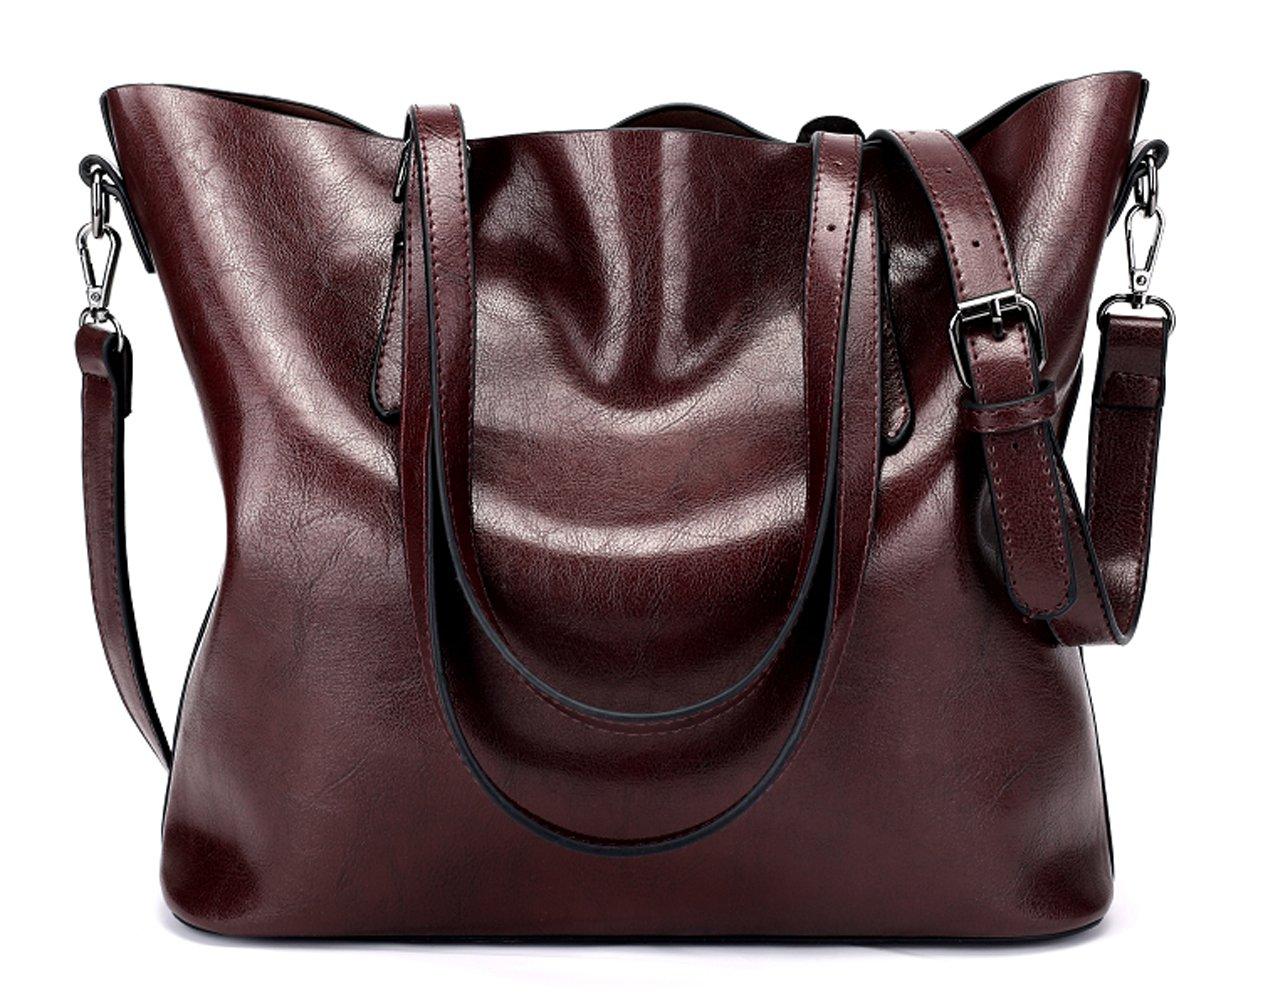 Dreubea Women's Soft Leather Handbag Hobo Crossbody Purse Tote Shoulder Bag Dark Red